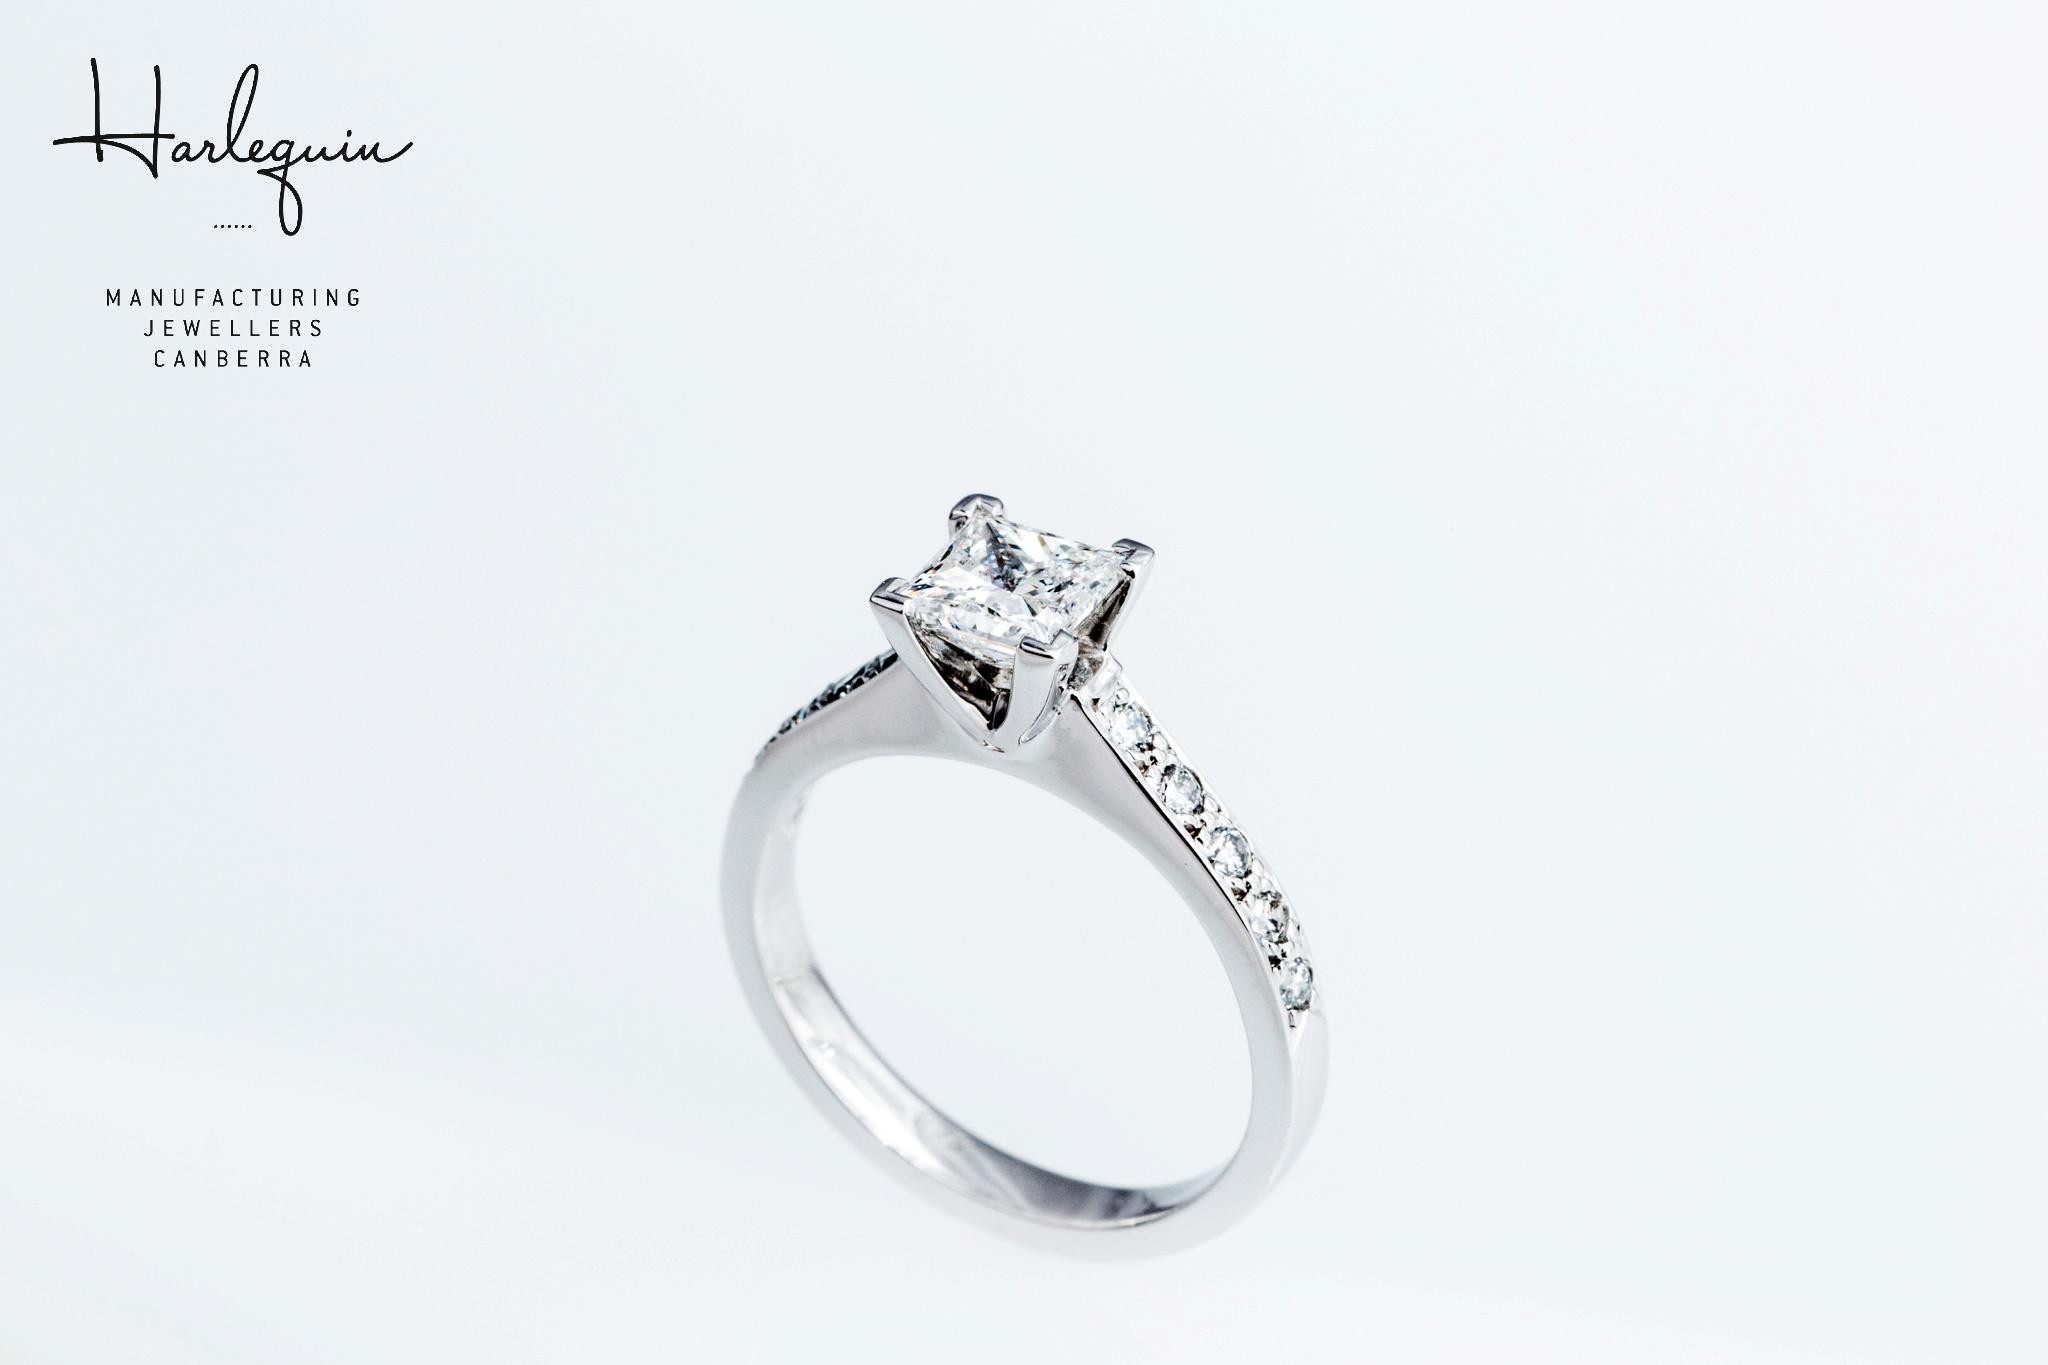 Style 3: Round brilliant cut diamonds in the band